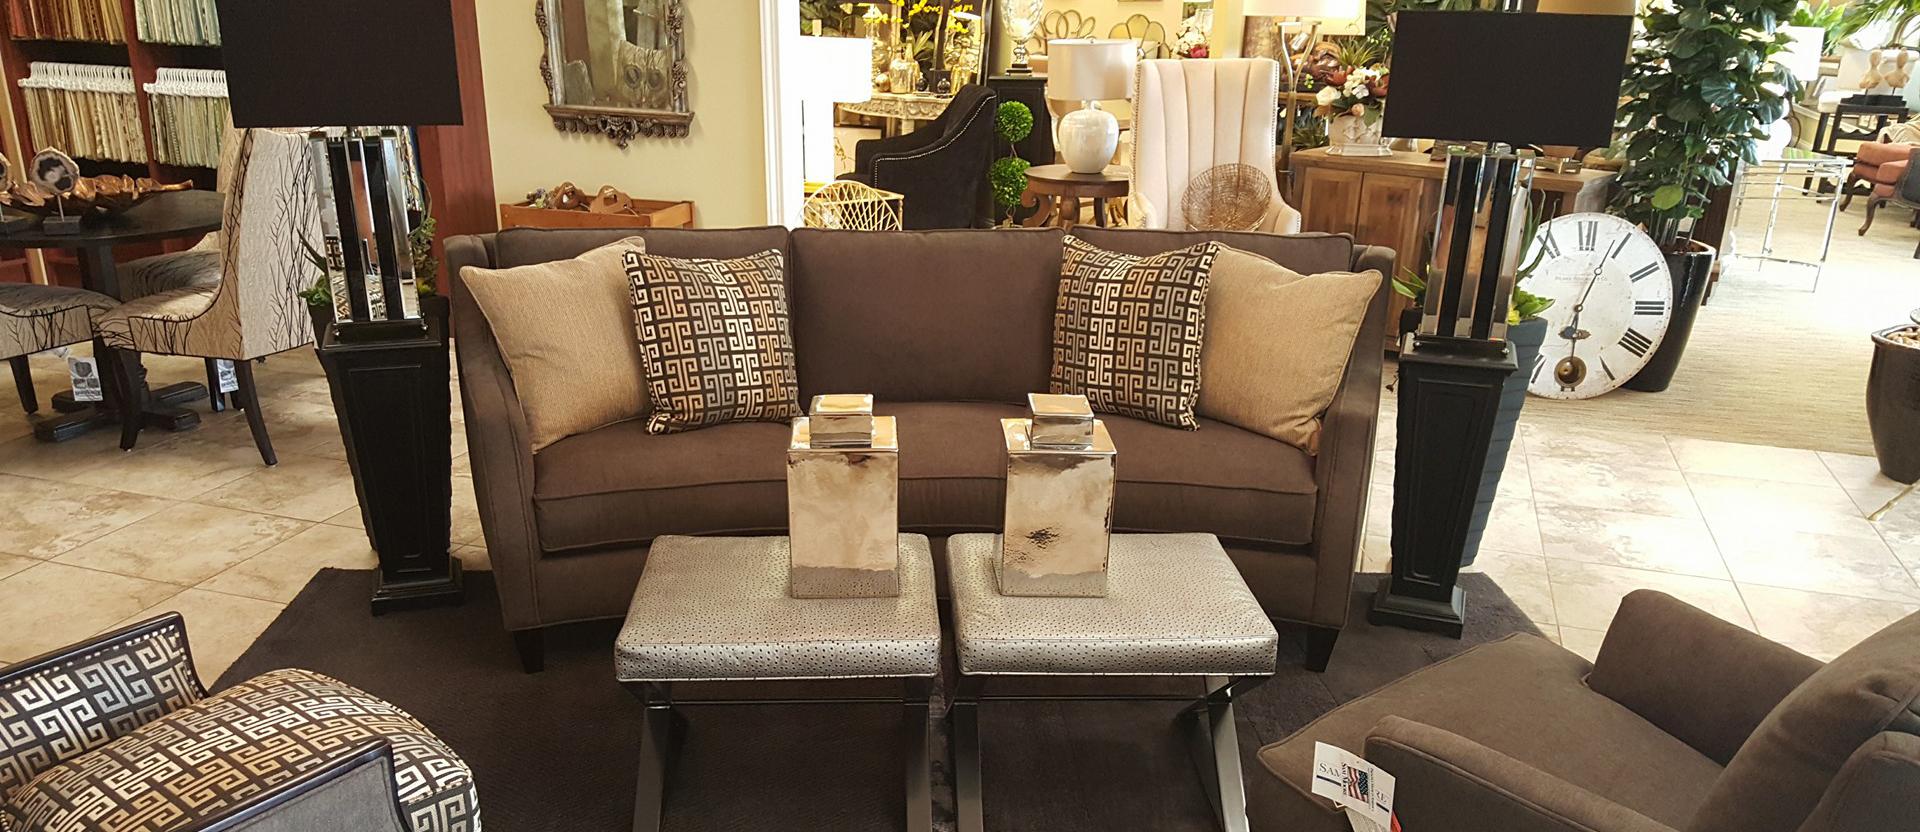 Interior Designer Jacksonville Fl Design Elements Home Furnishings